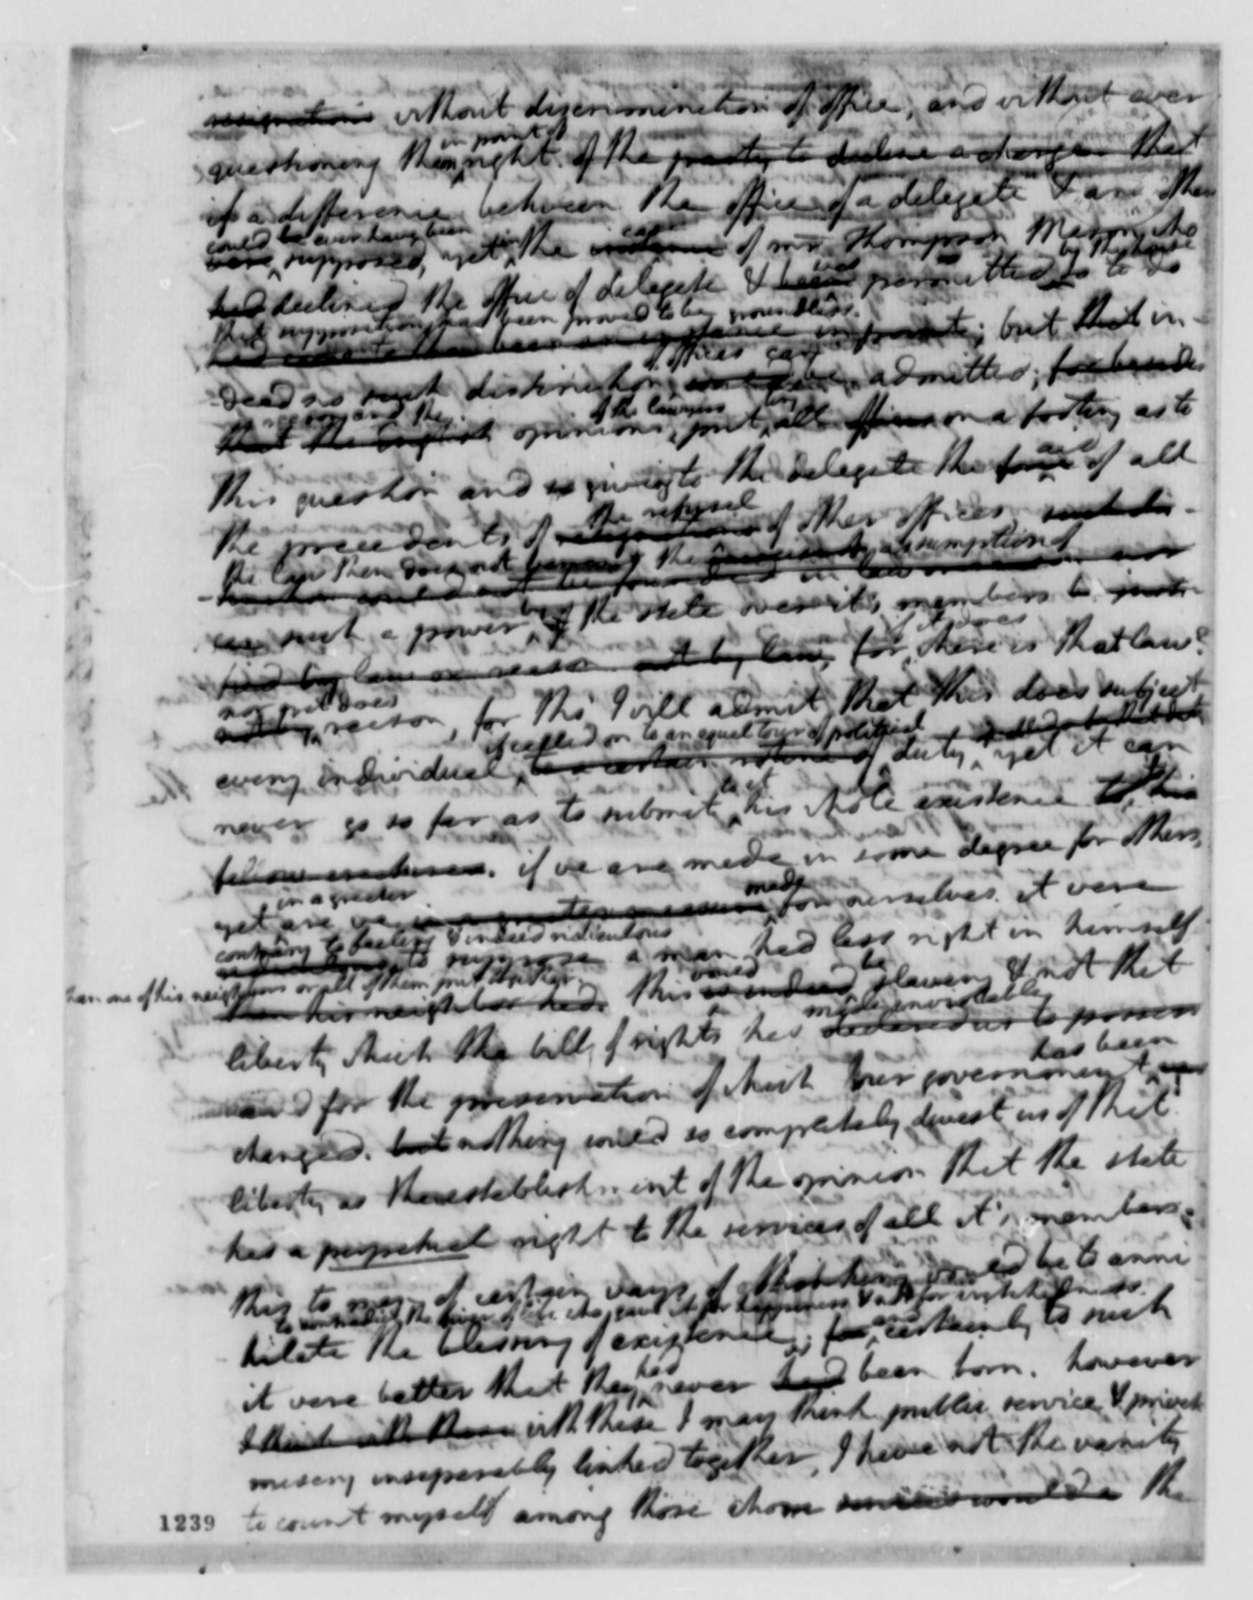 Thomas Jefferson to James Monroe, May 20, 1782